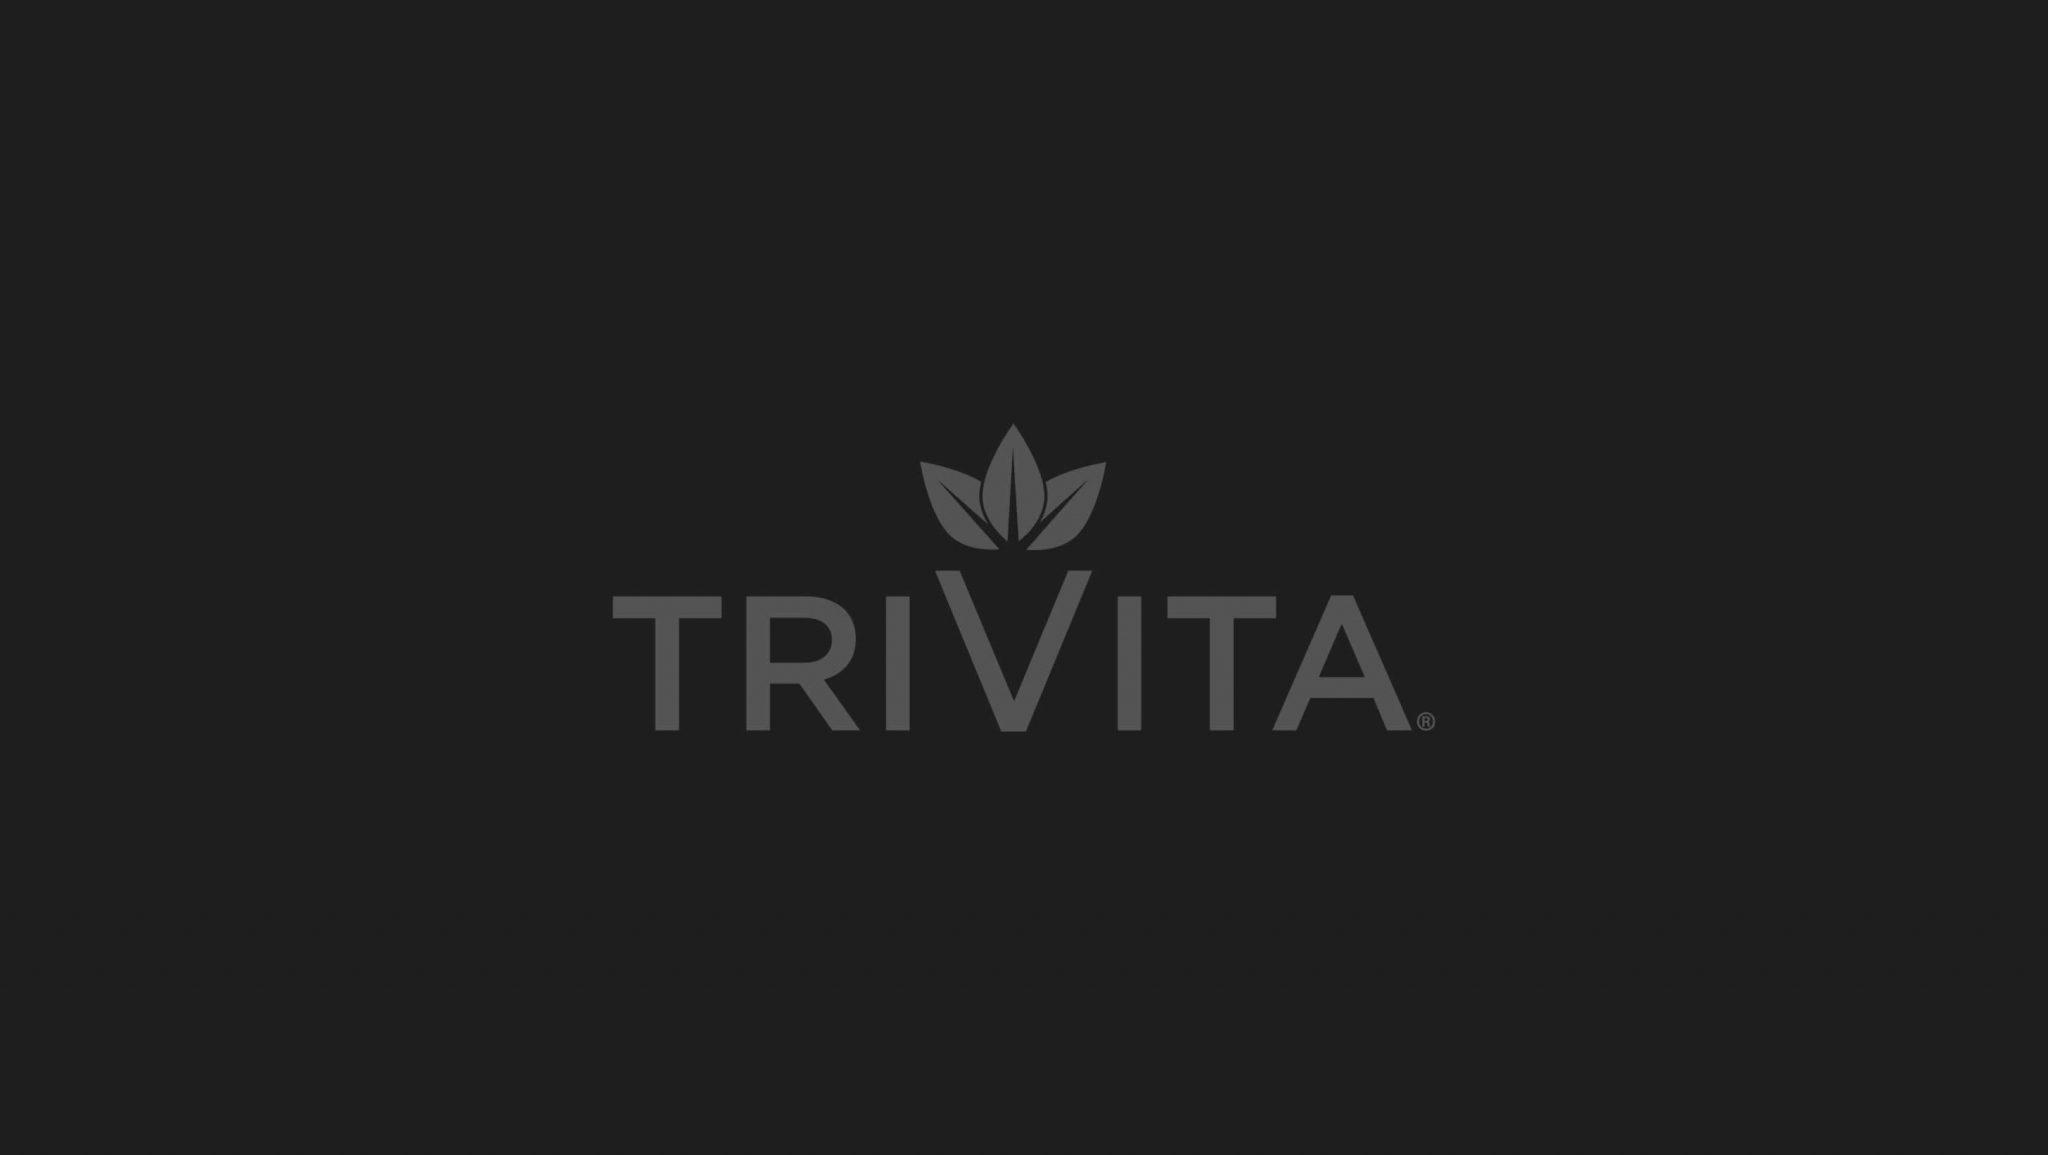 Trivita_Logo